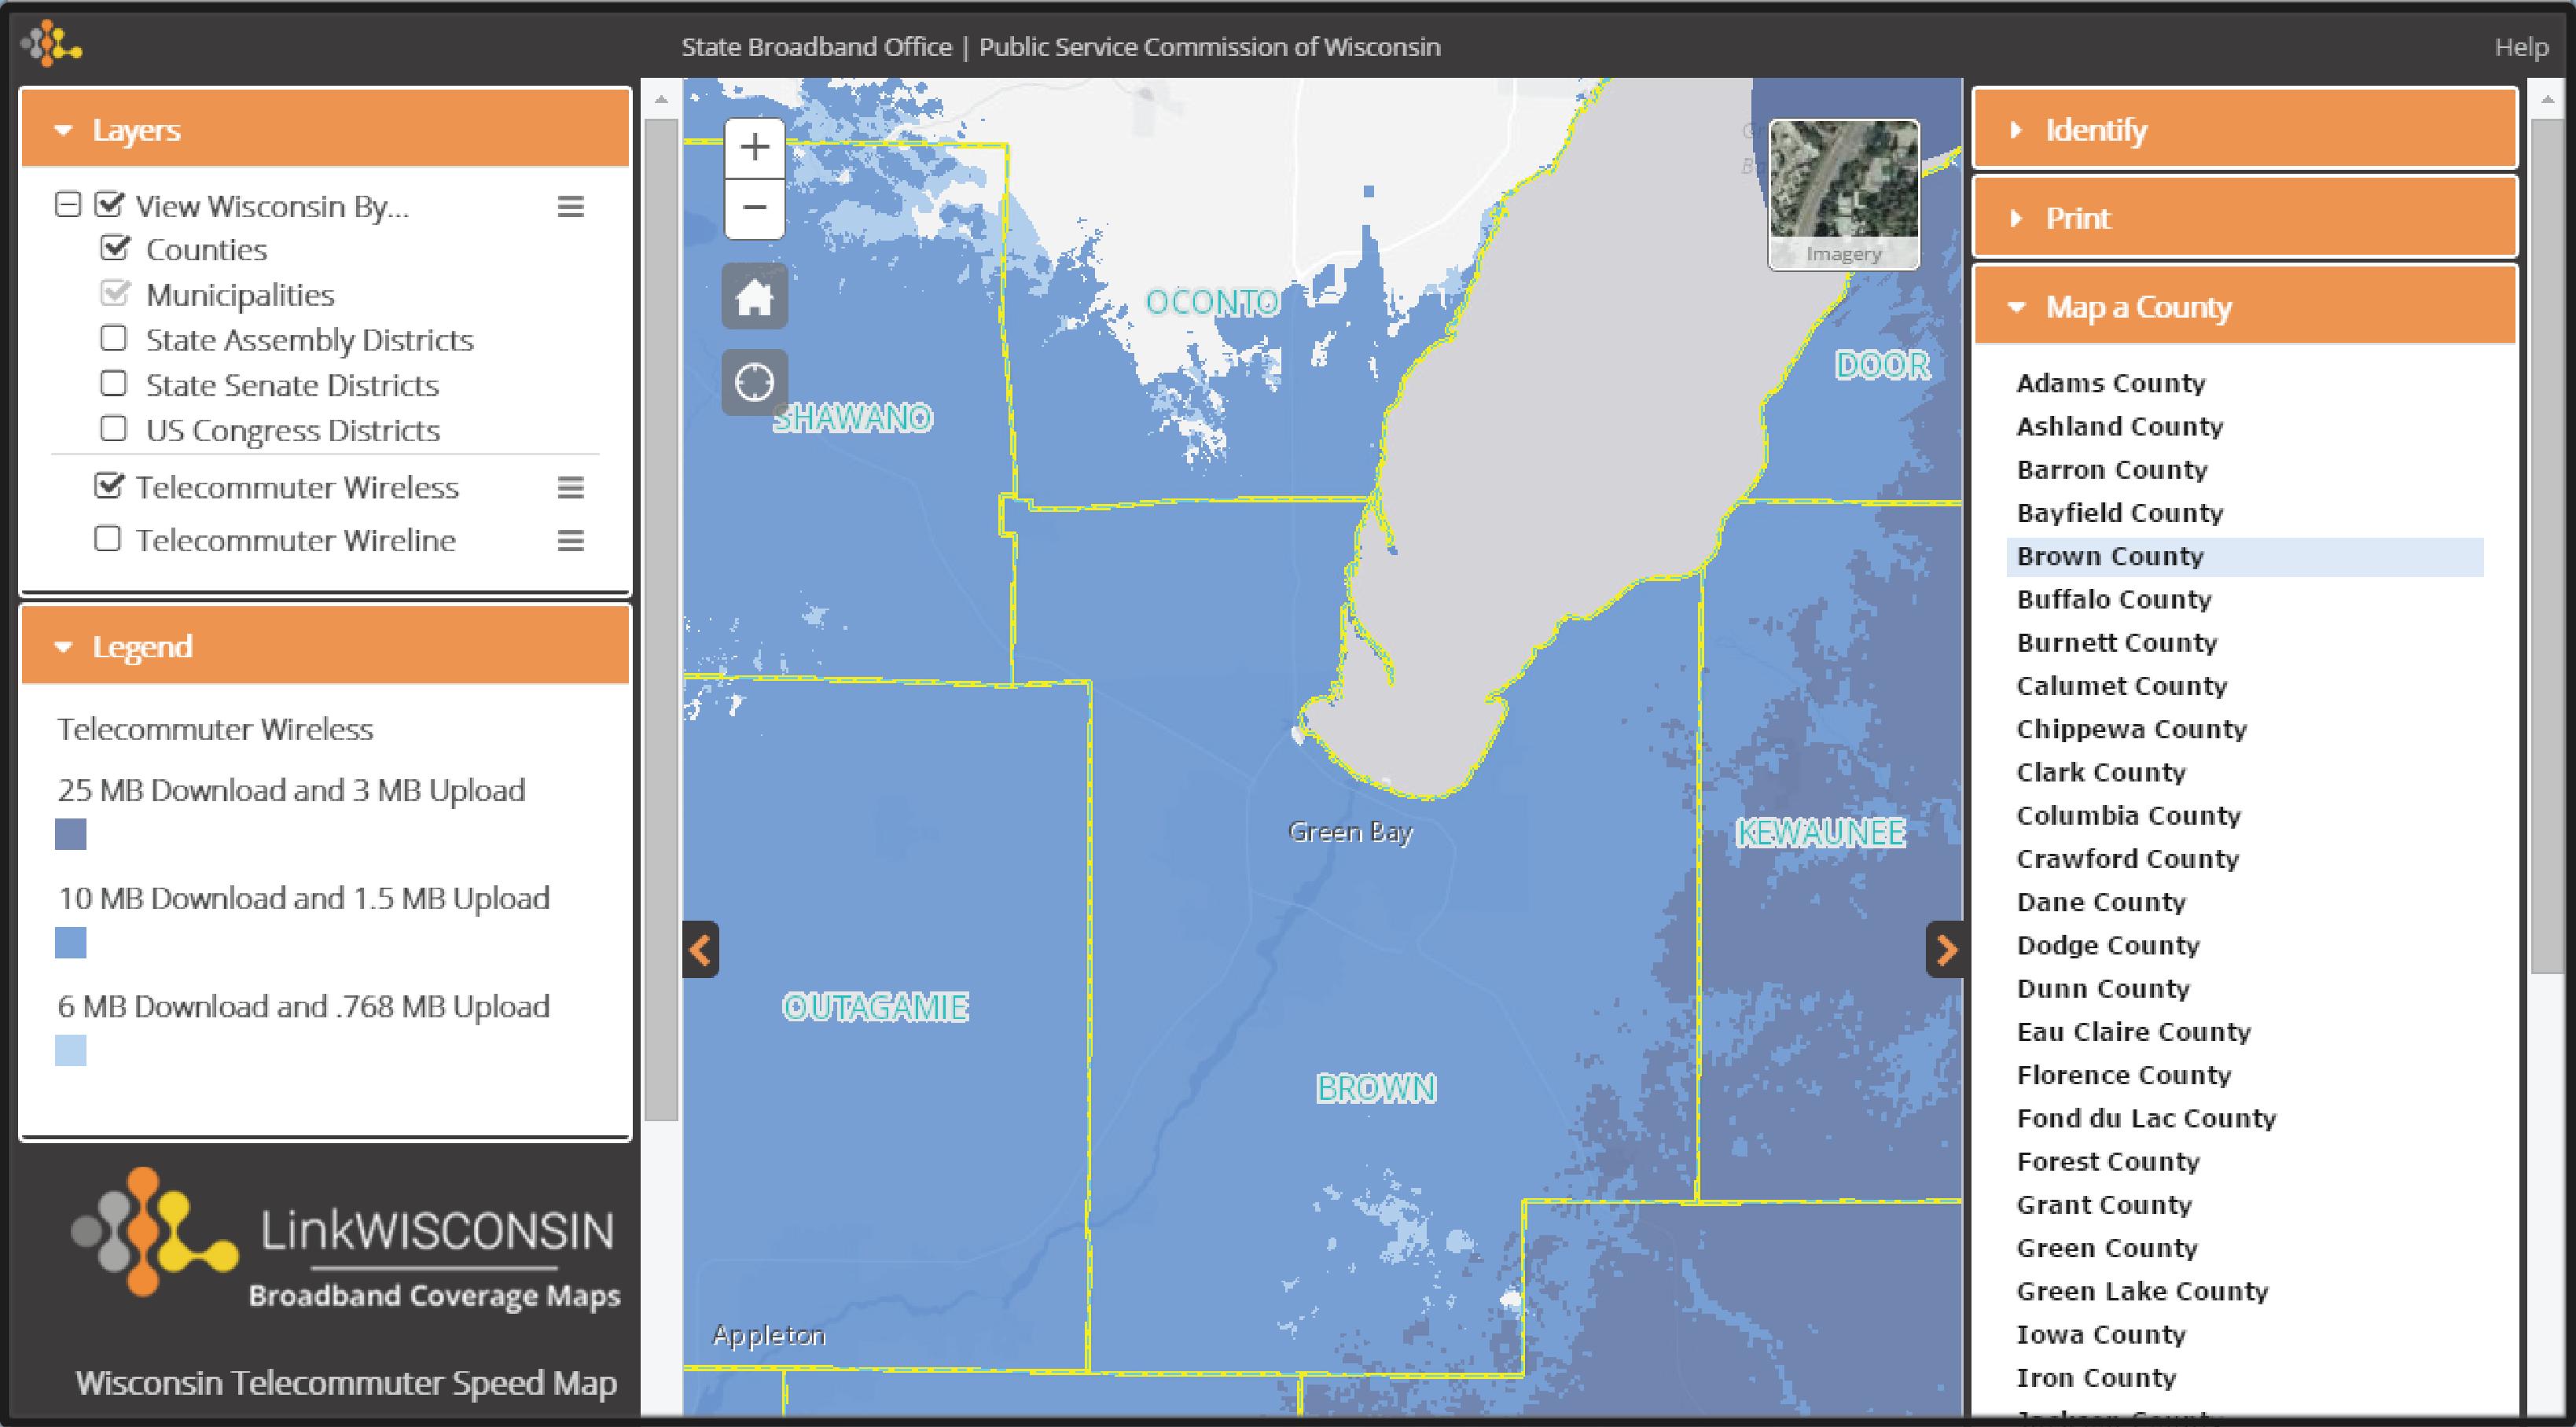 wisconsin telecommuter speed map colterrific maps a portfolio telecommuter speed map portfolio footer